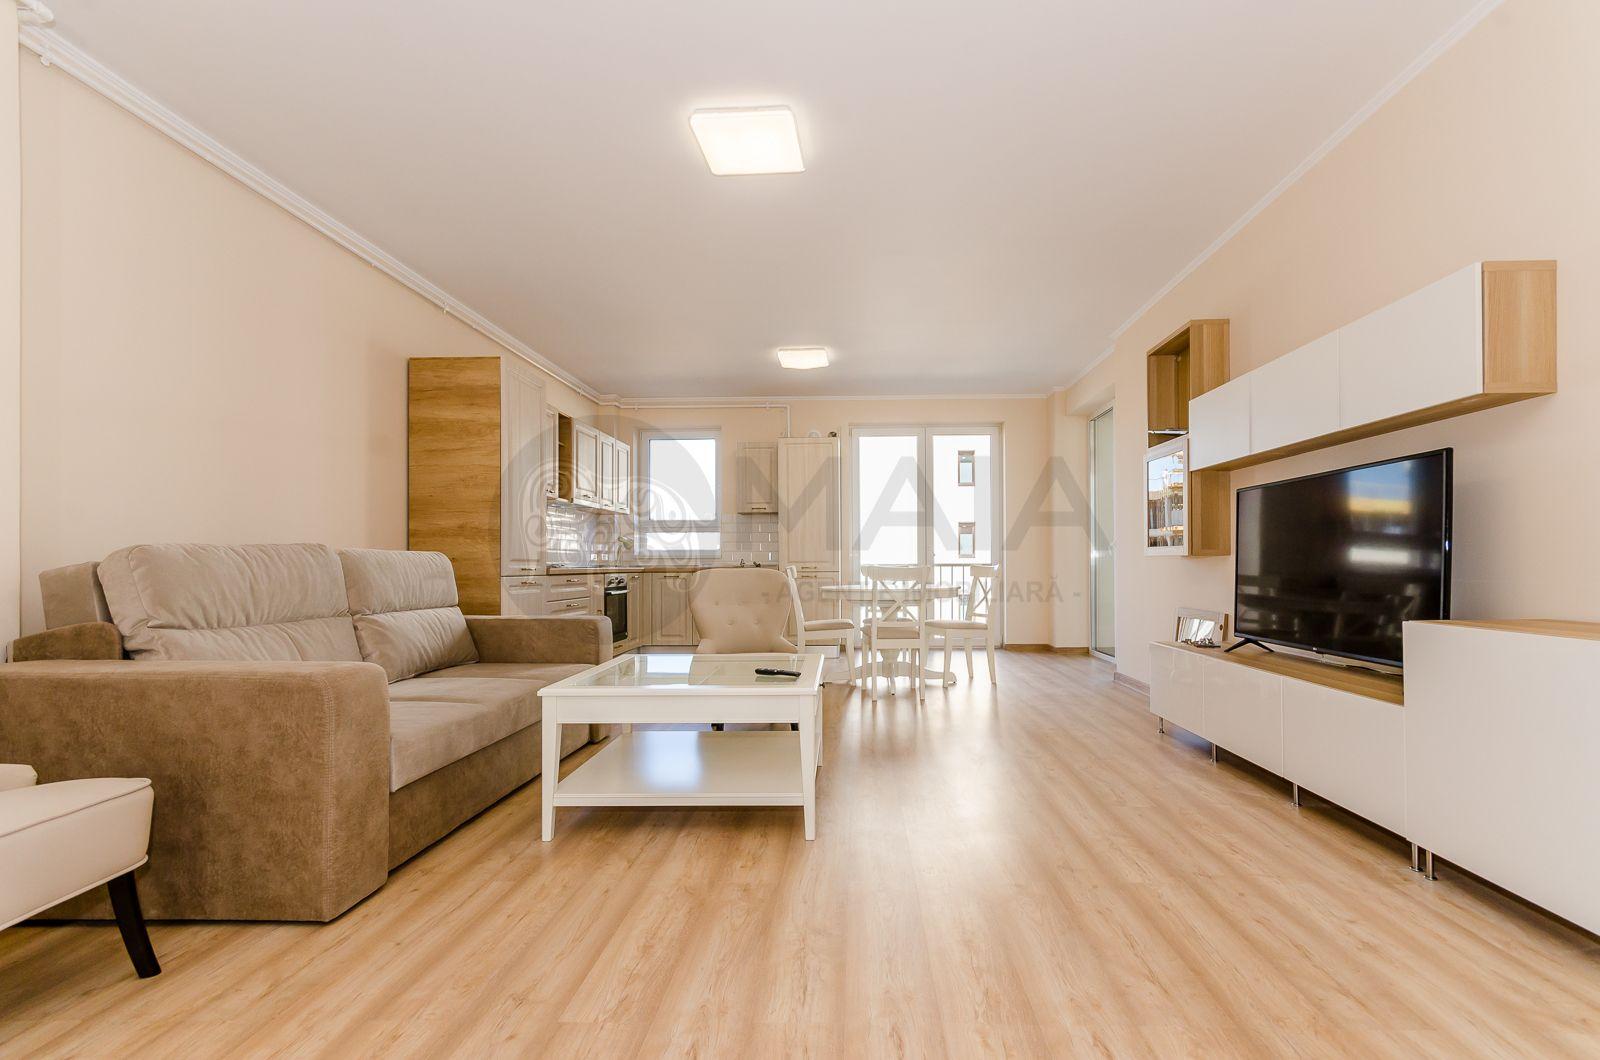 Apartament 3 camere, TOTUL NOU, prima inchiriere, parcare, Central